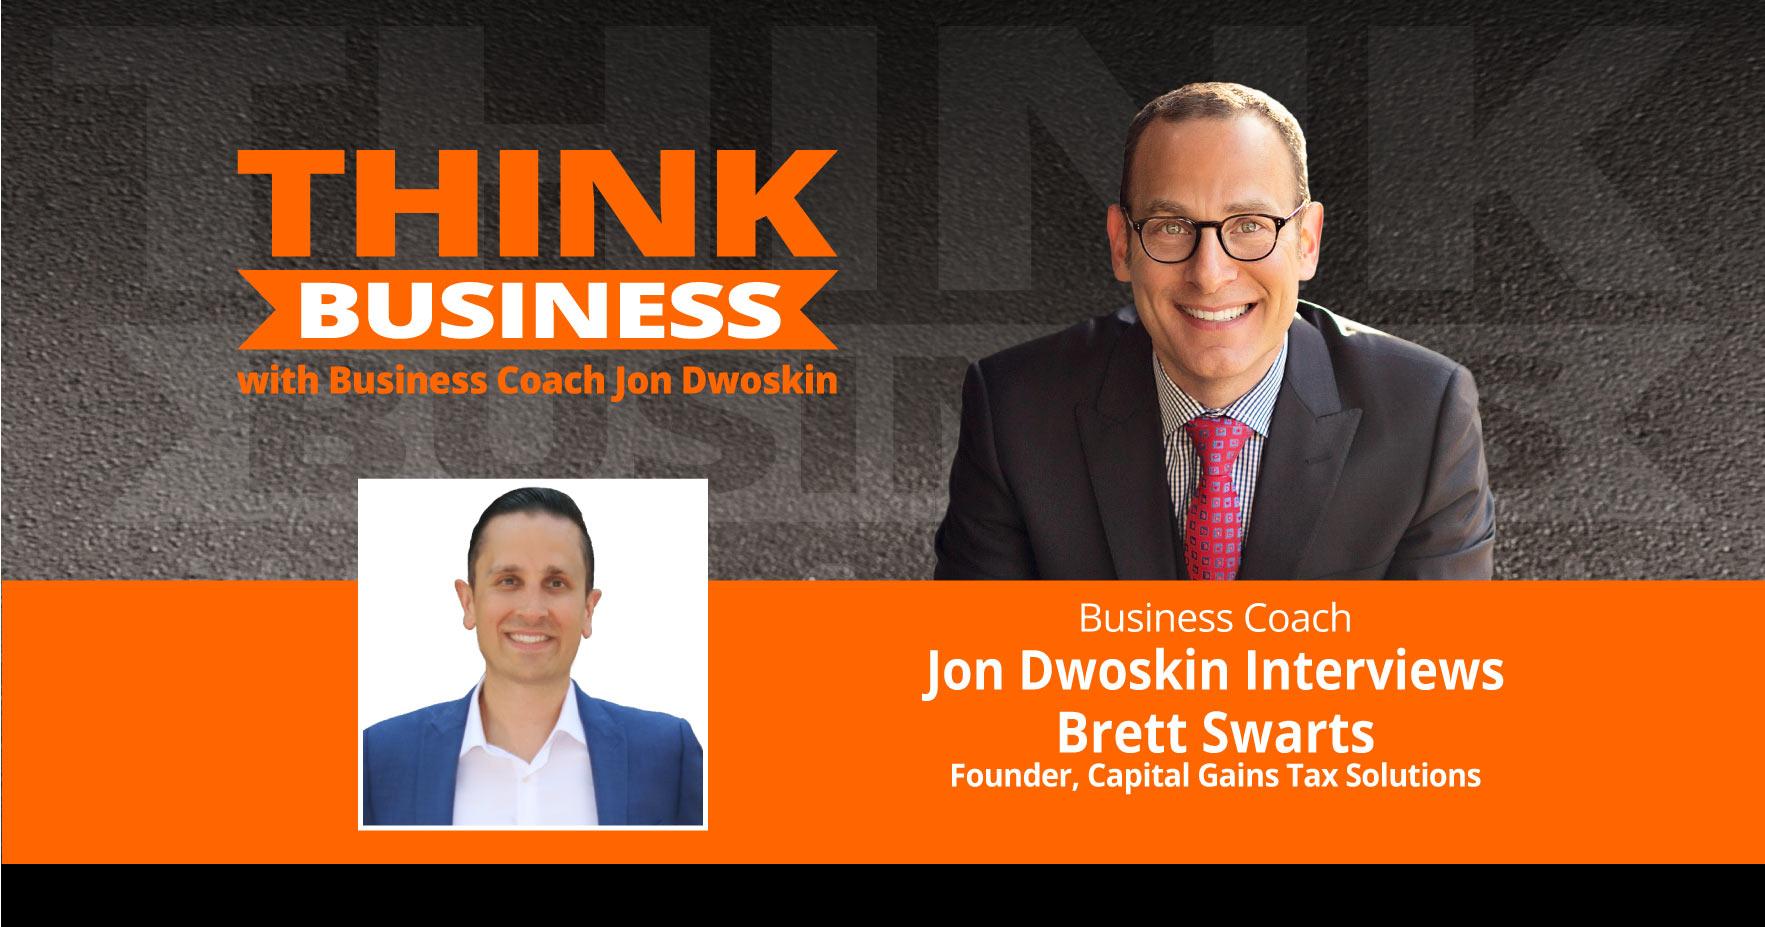 THINK Business Podcast: Jon Dwoskin Talks with Brett Swarts